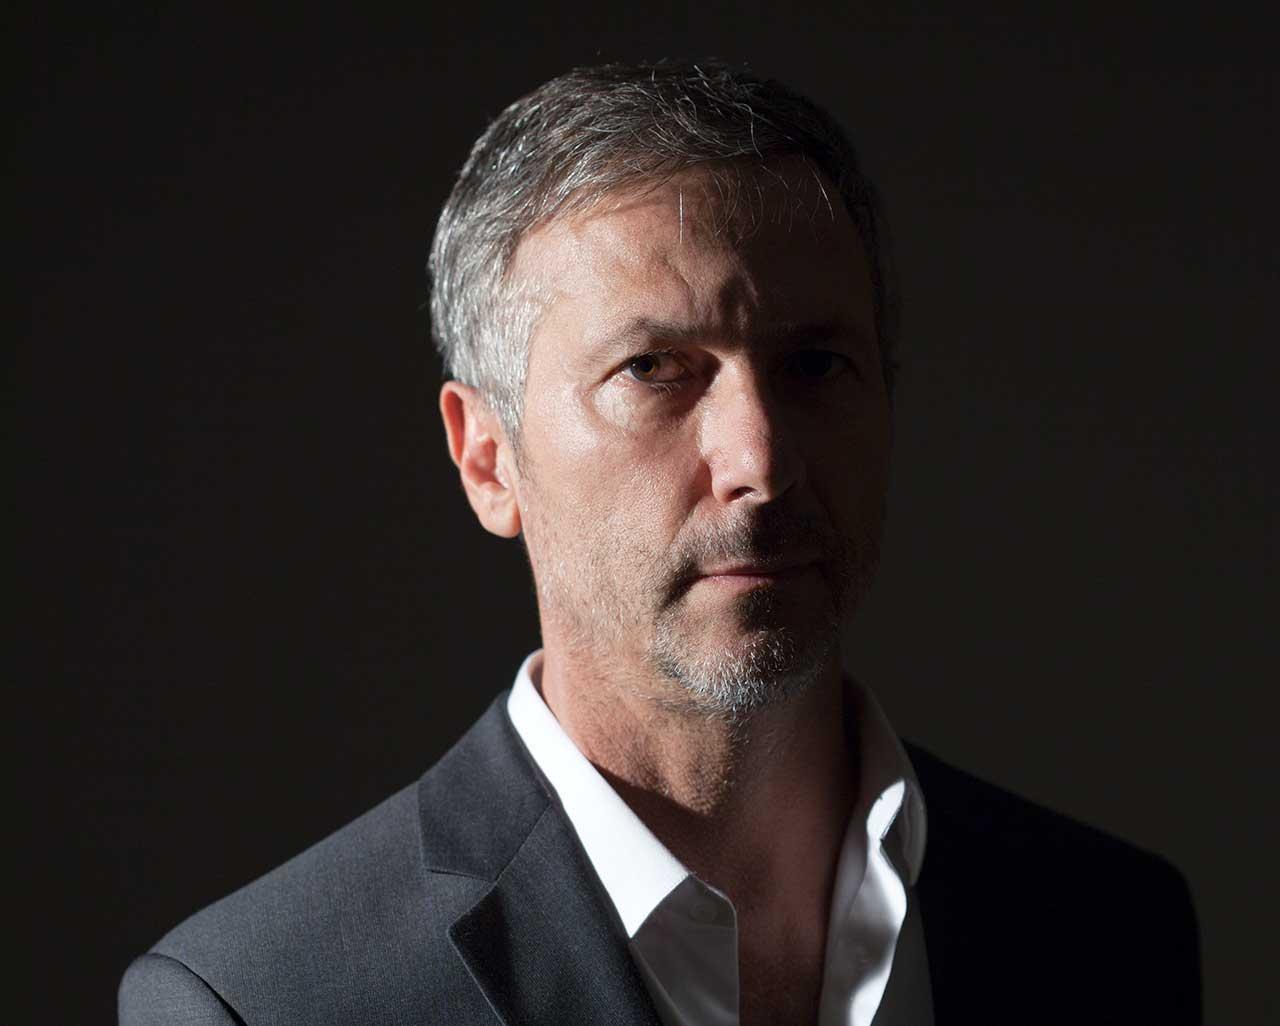 Listen to Clever Podcast Episode 92: Designer Humberto Campana